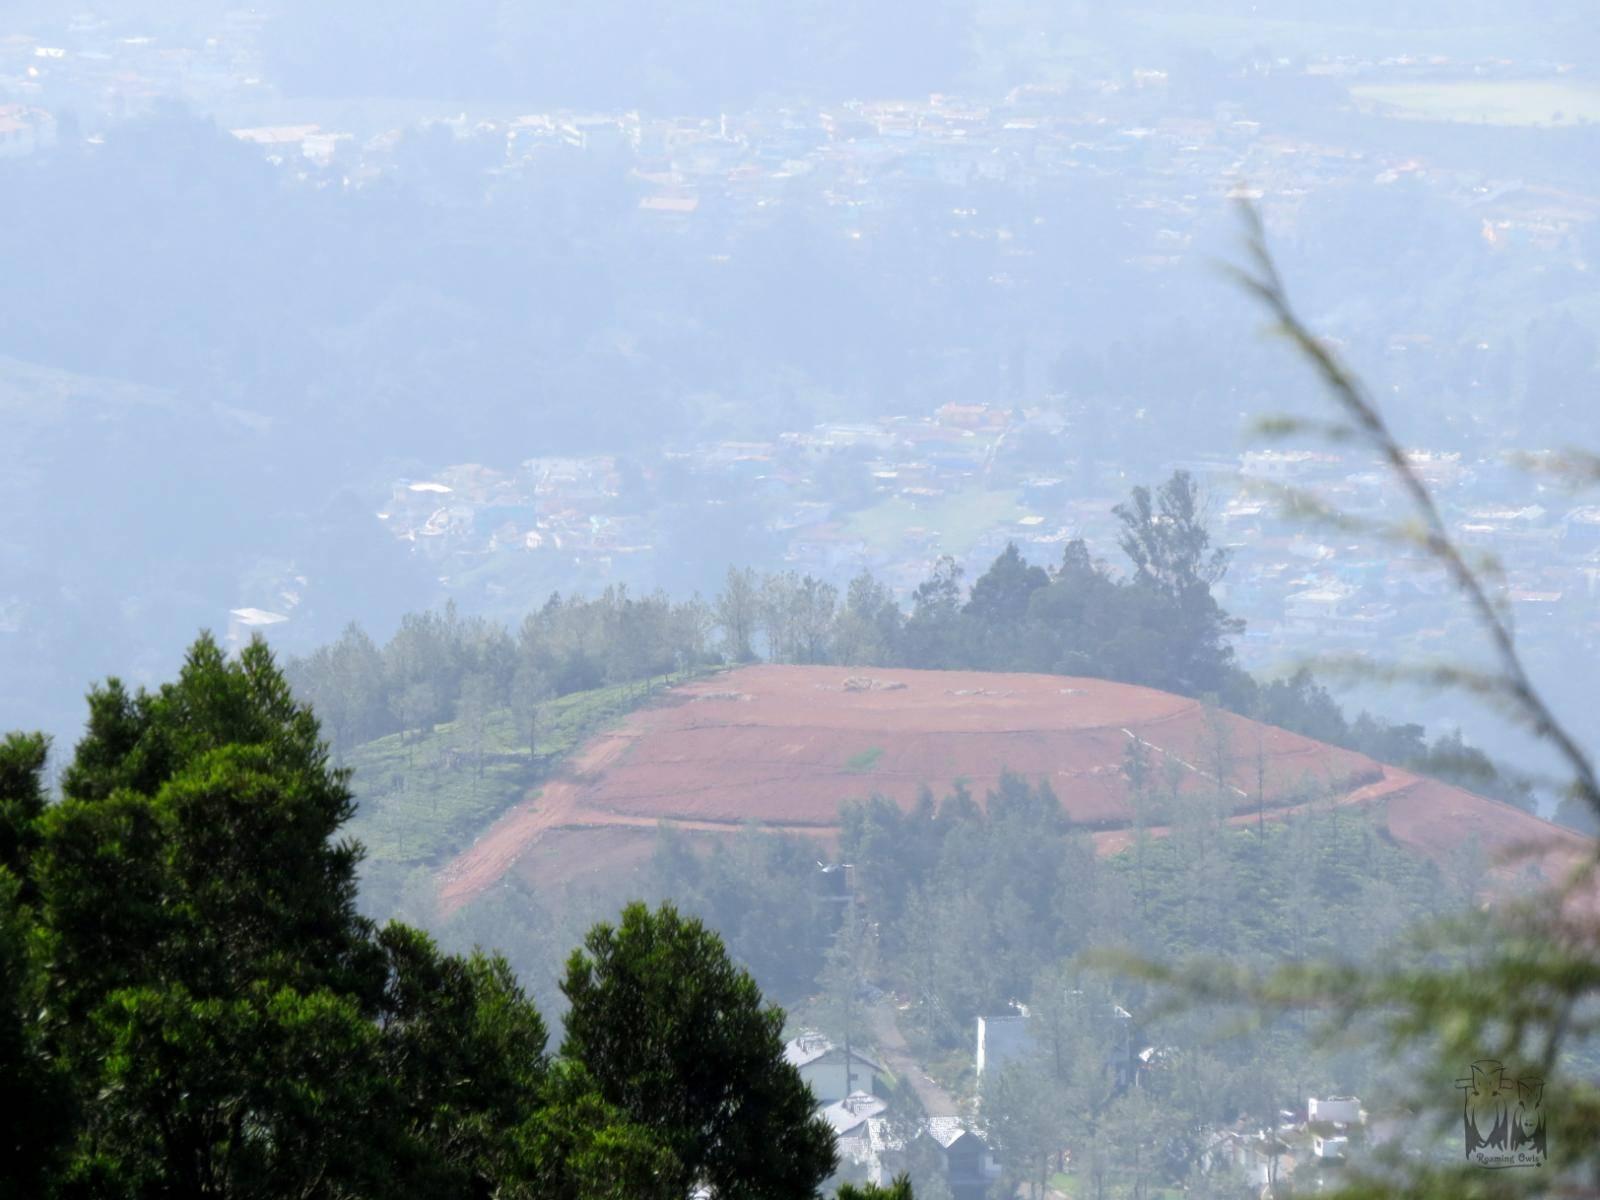 Nilgiri destruction, neelkurinji loss of habitat